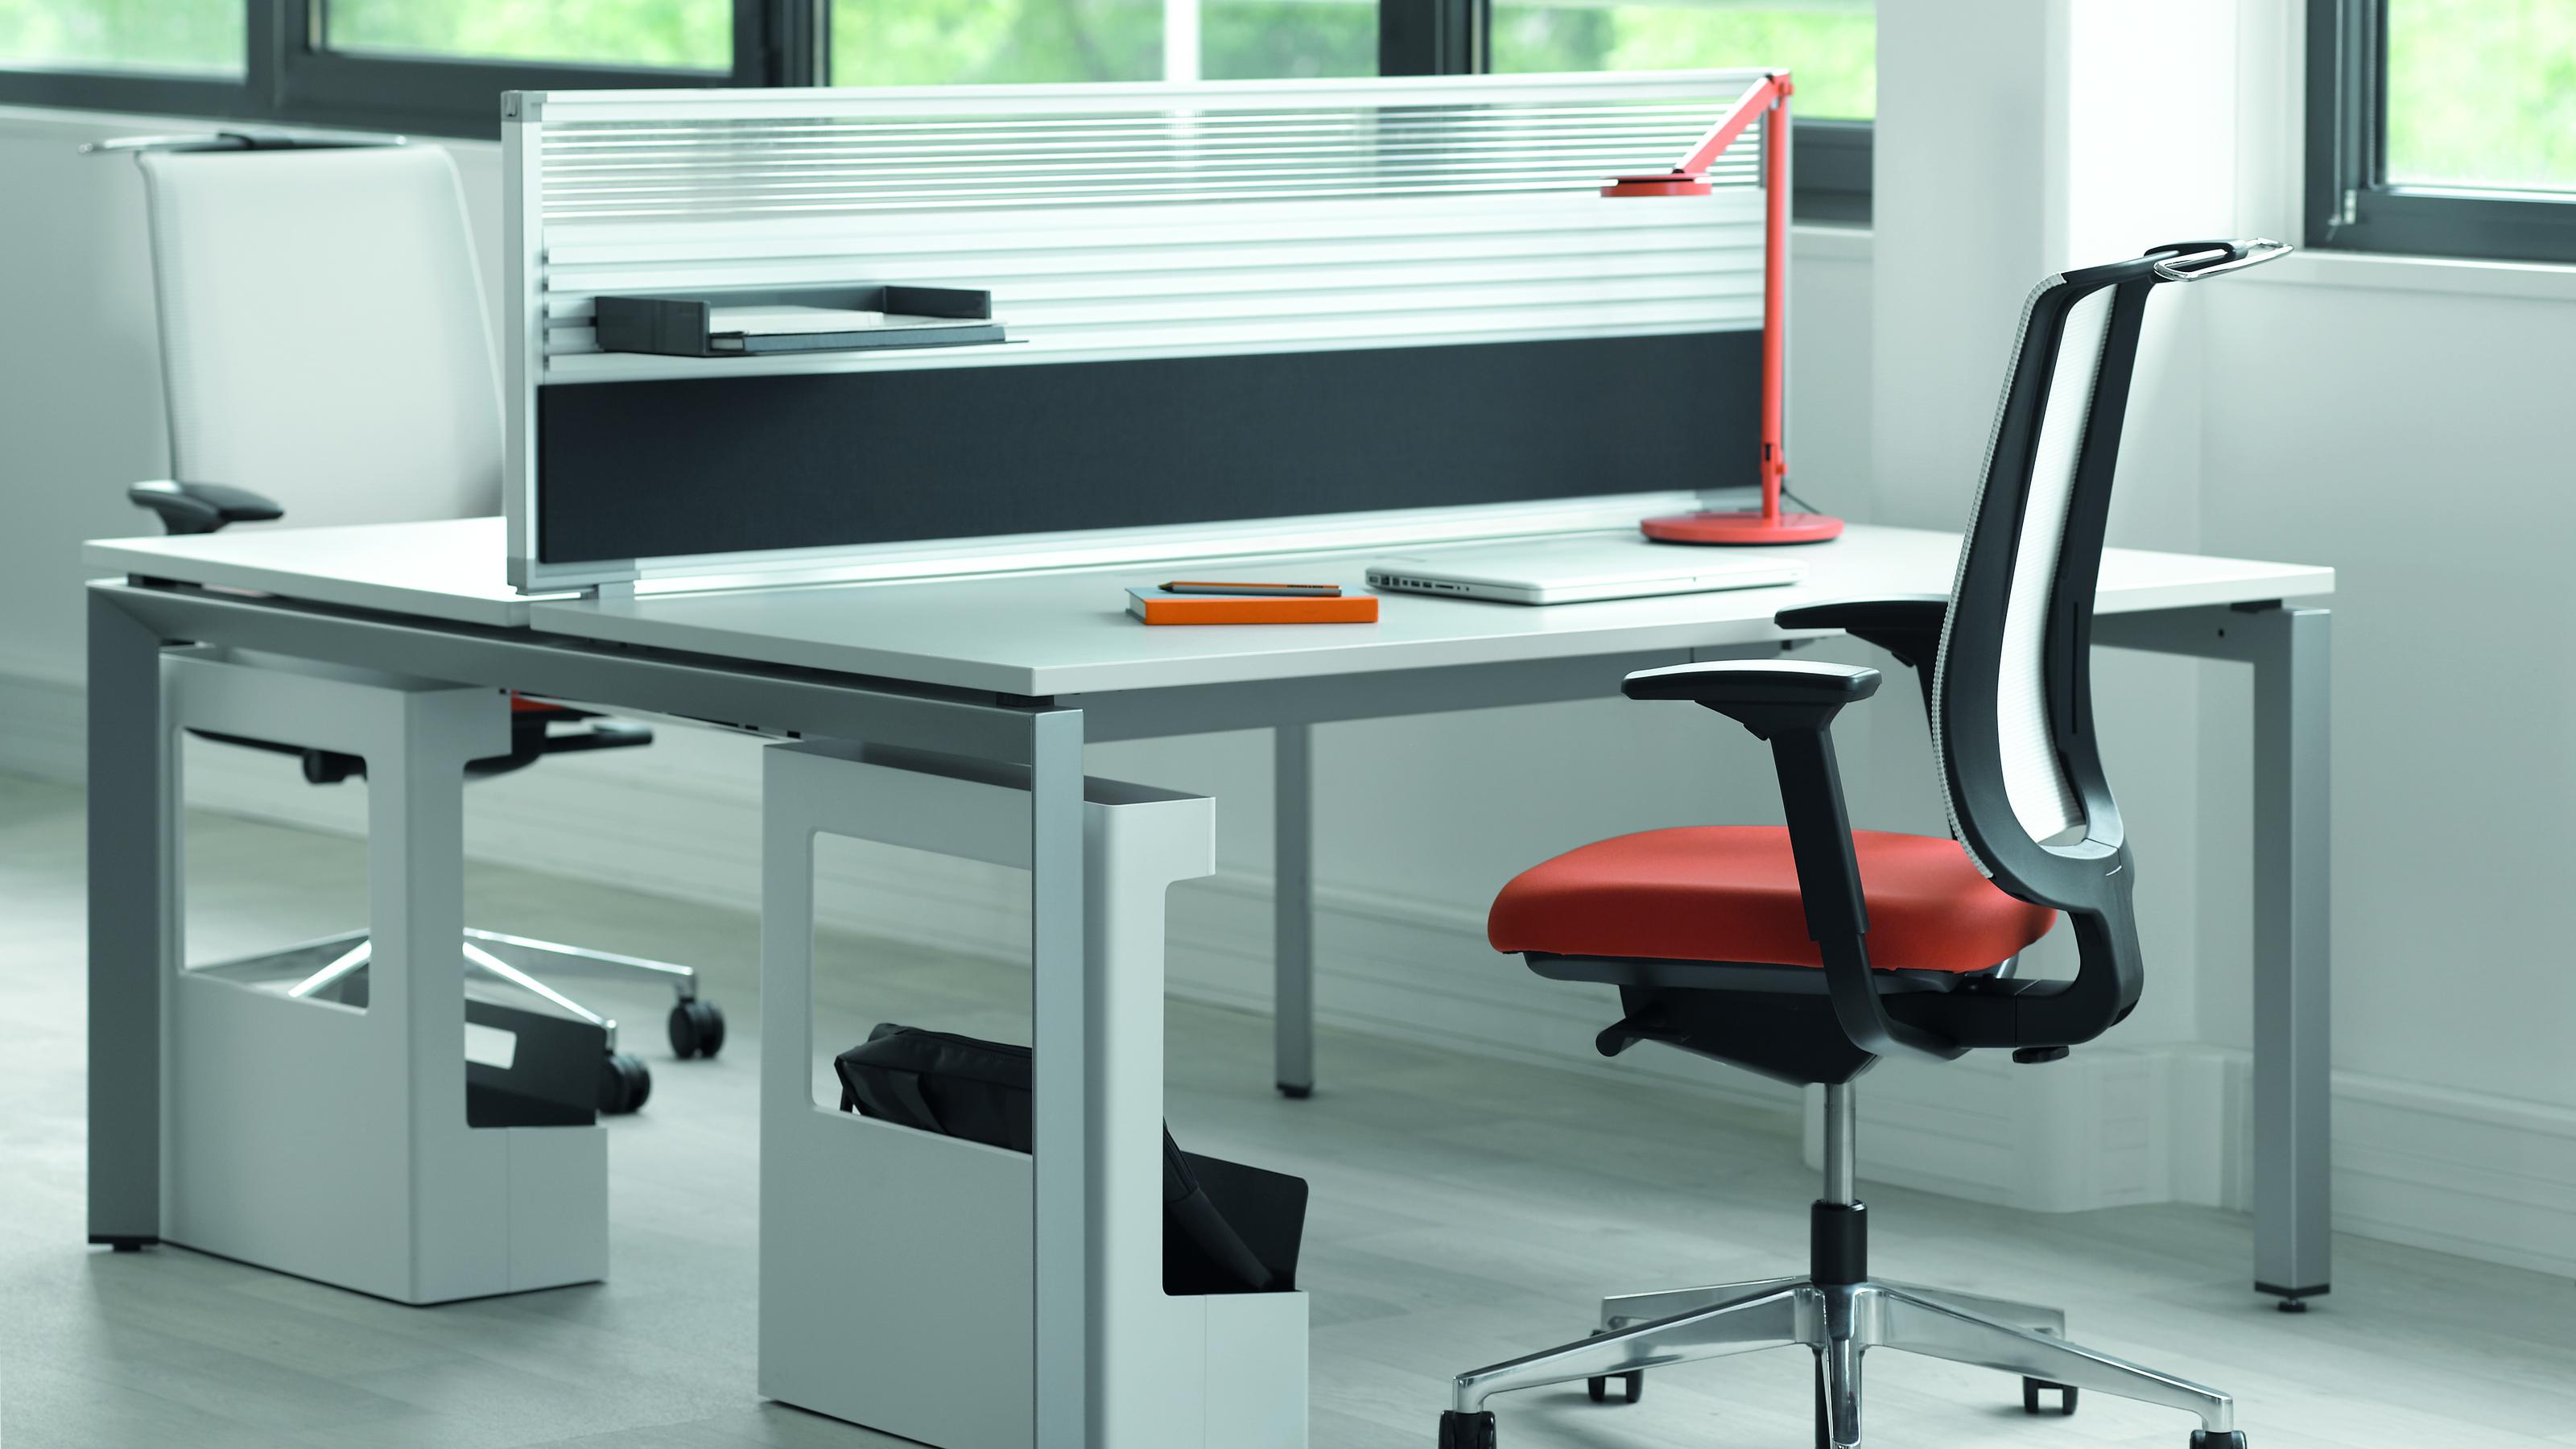 media steelcase steelcase modular office furniture steelcase office furniture assembly instructions